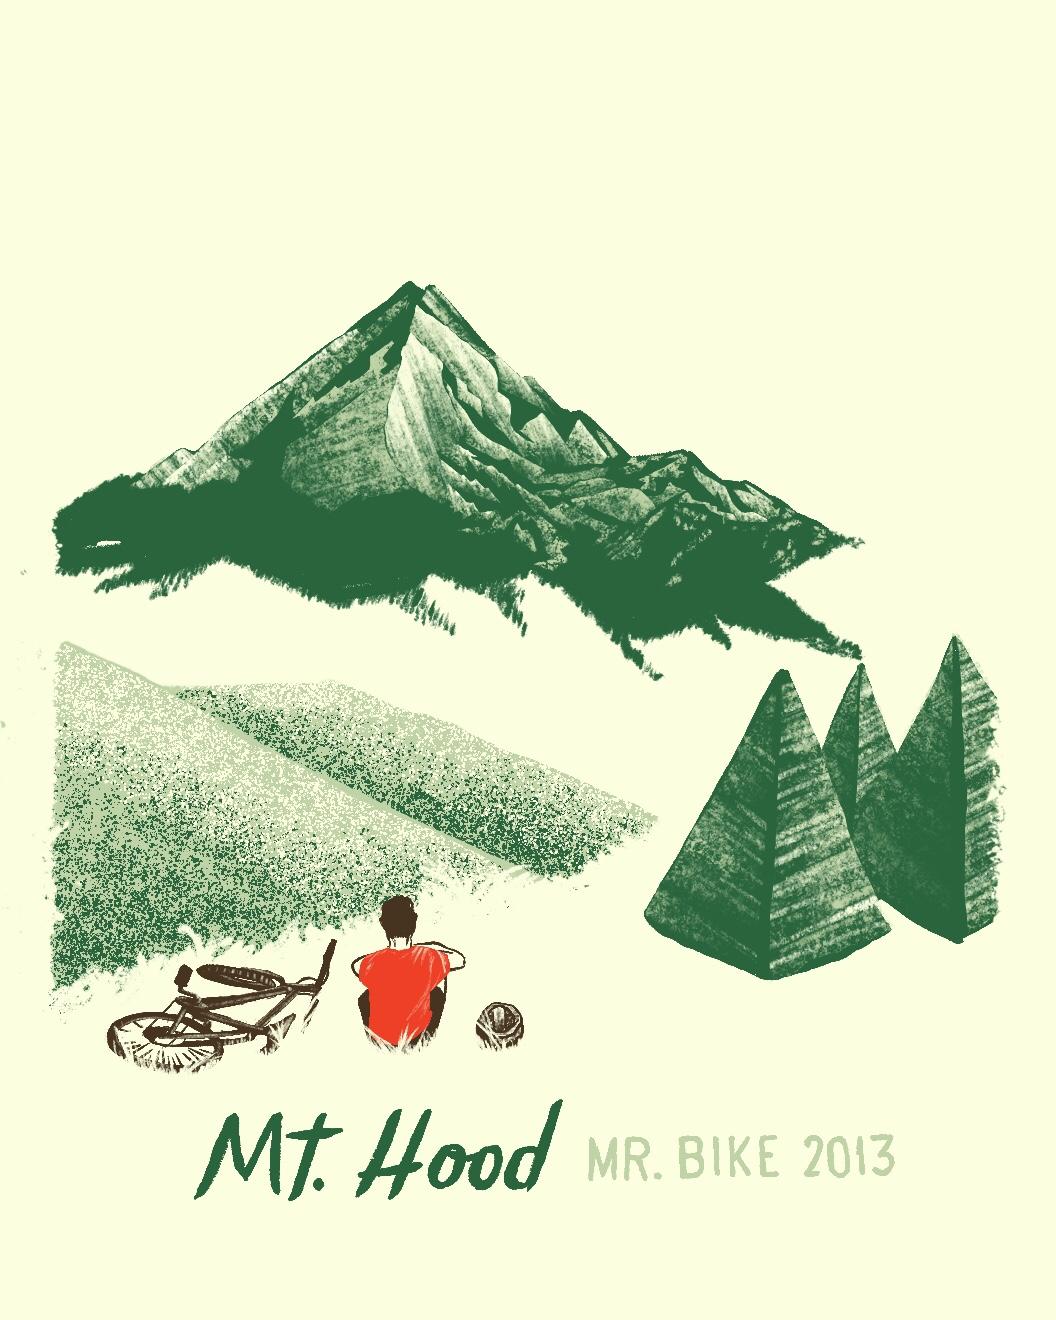 Mount Hood biking trip illustration